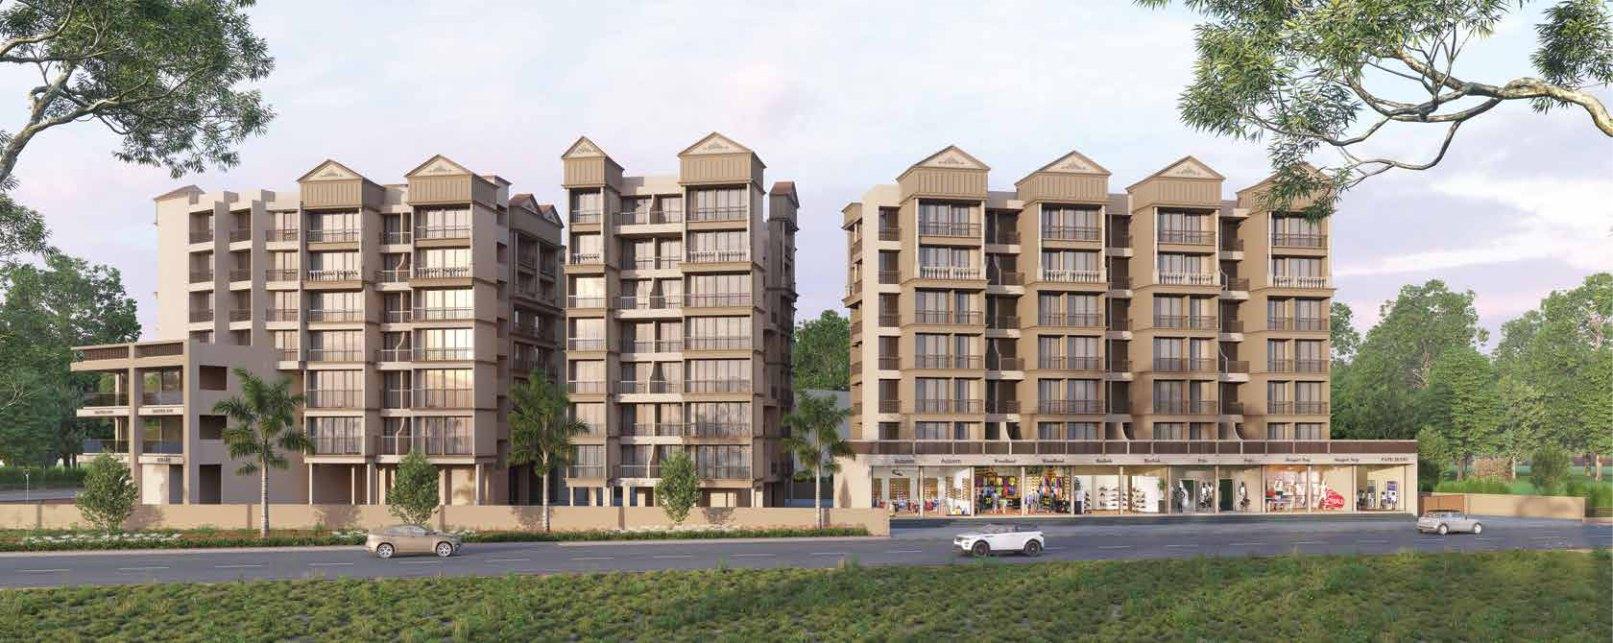 1 & 2 BHK Flats in Neral Mumbai in Laxmi Icon - Sqmtrs